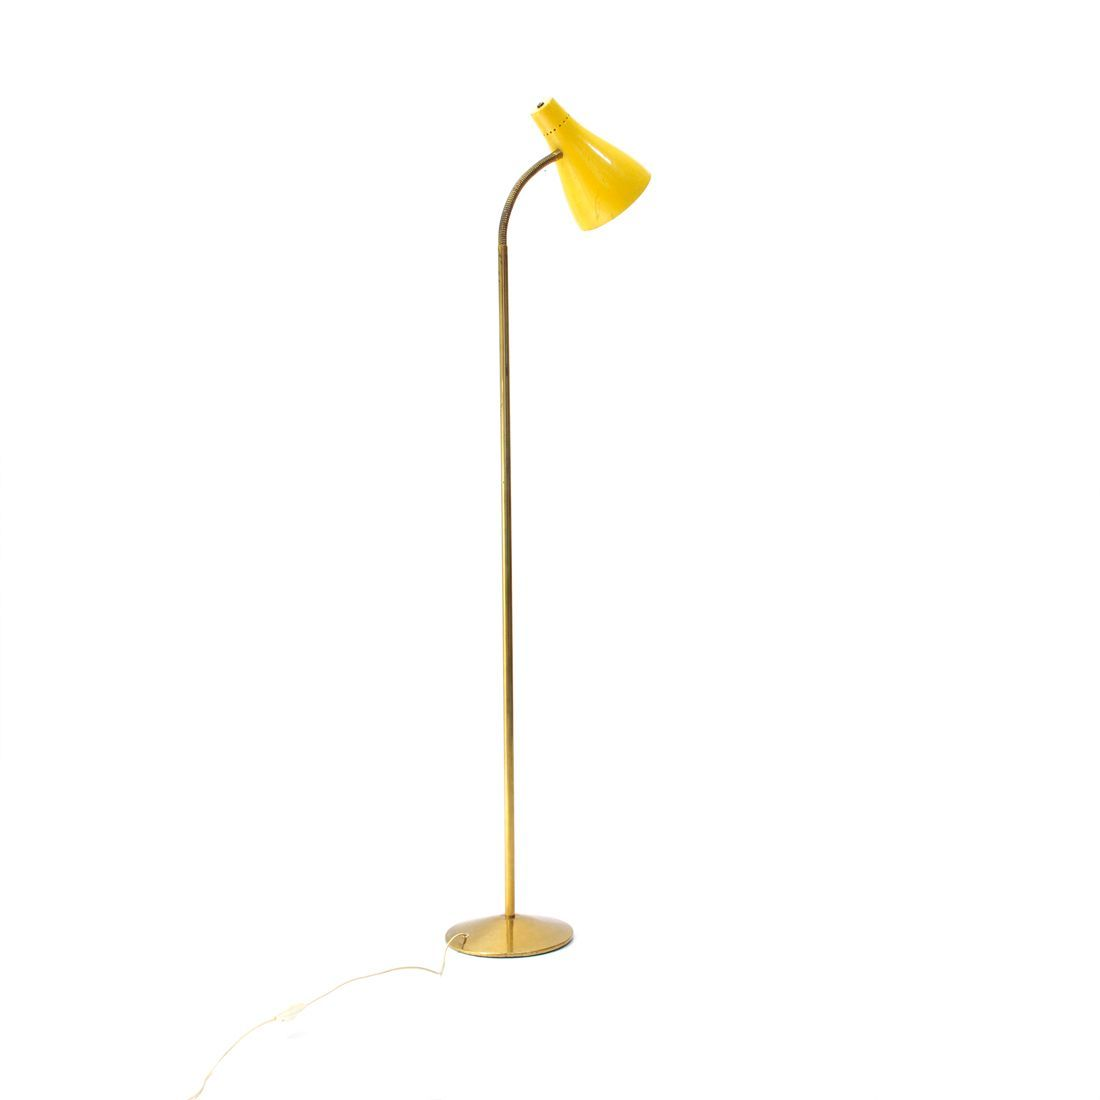 Led Deckenfluter Dimmbar Farbwechsel Moderne Stehlampe Design